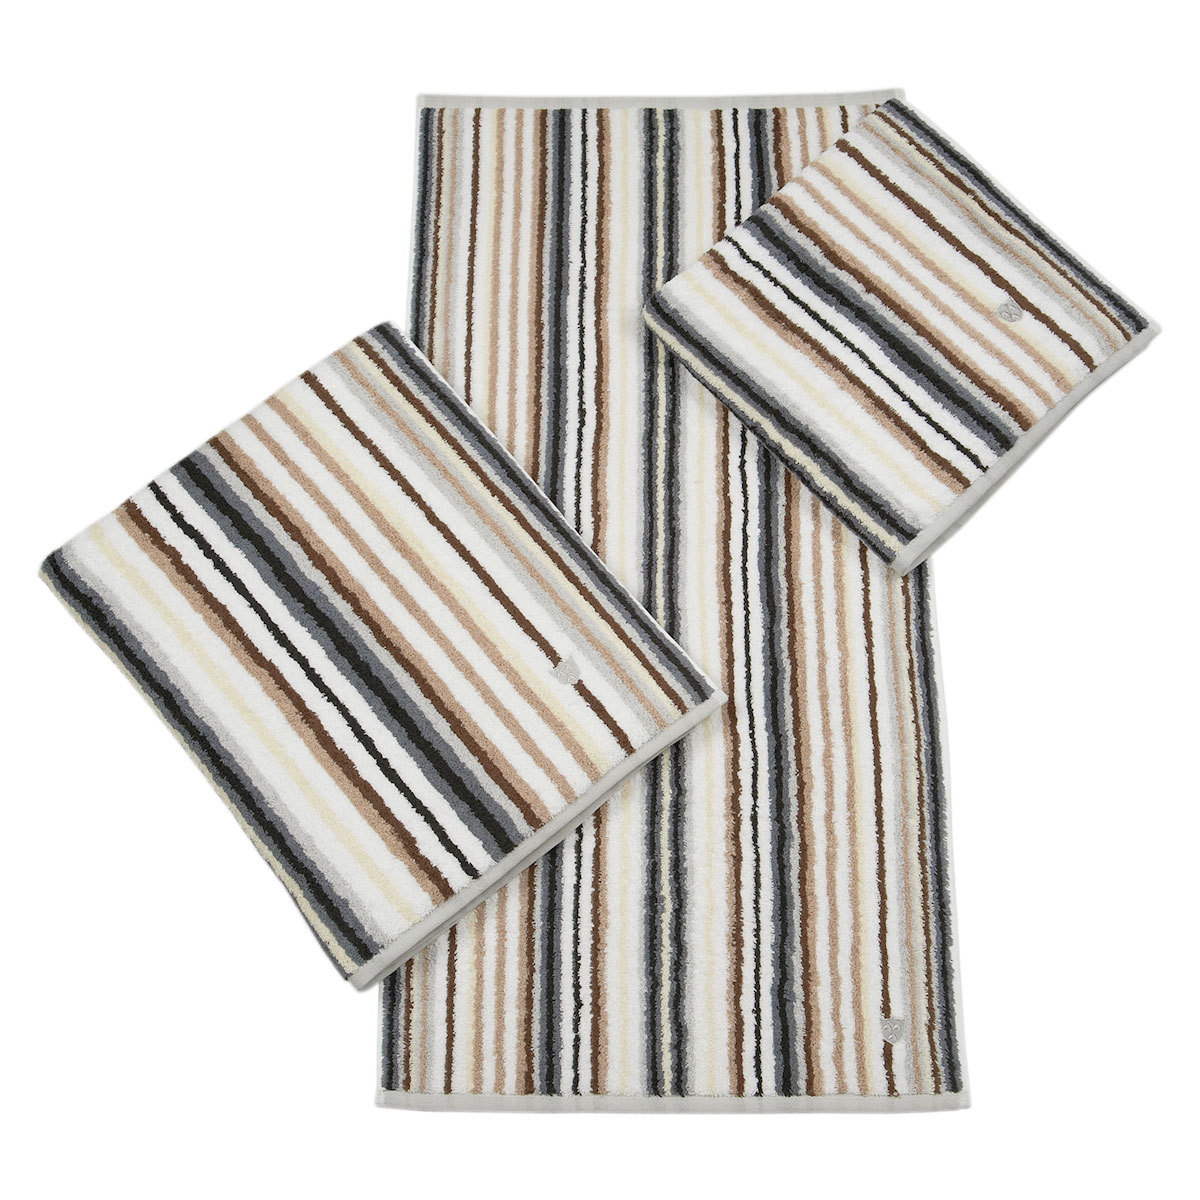 Ross Handtücher Multicolor-Streifen anthrazit